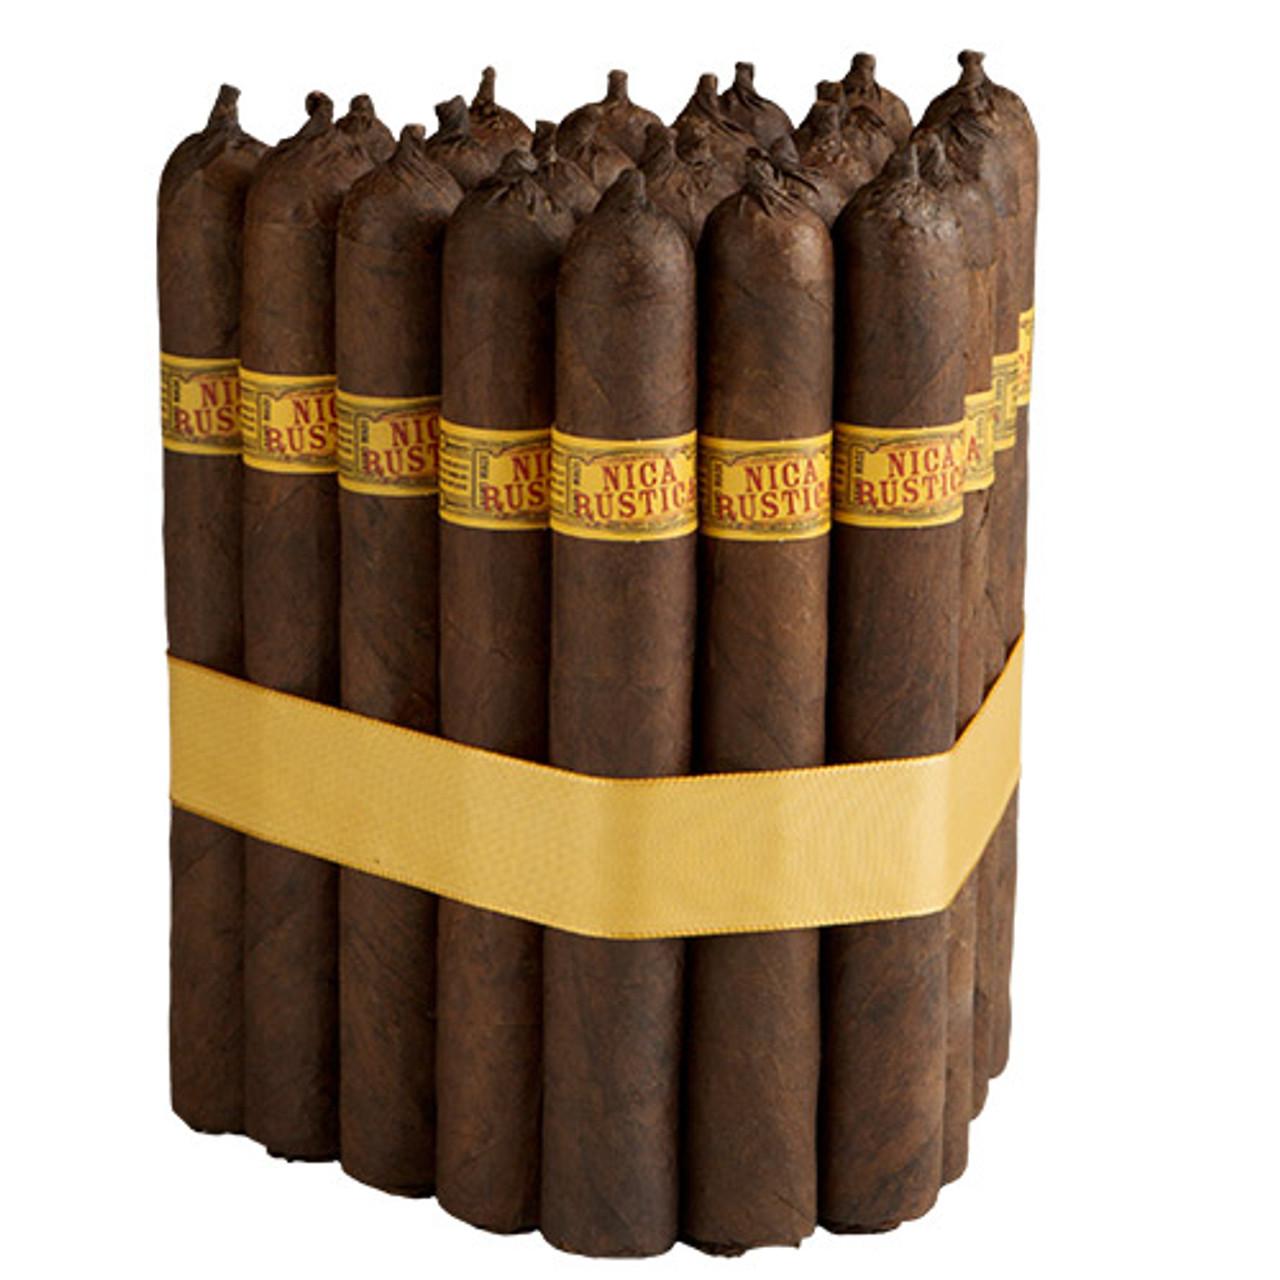 Nica Rustica Belly Cigars - 7.5 x 50 (Bundle of 25)